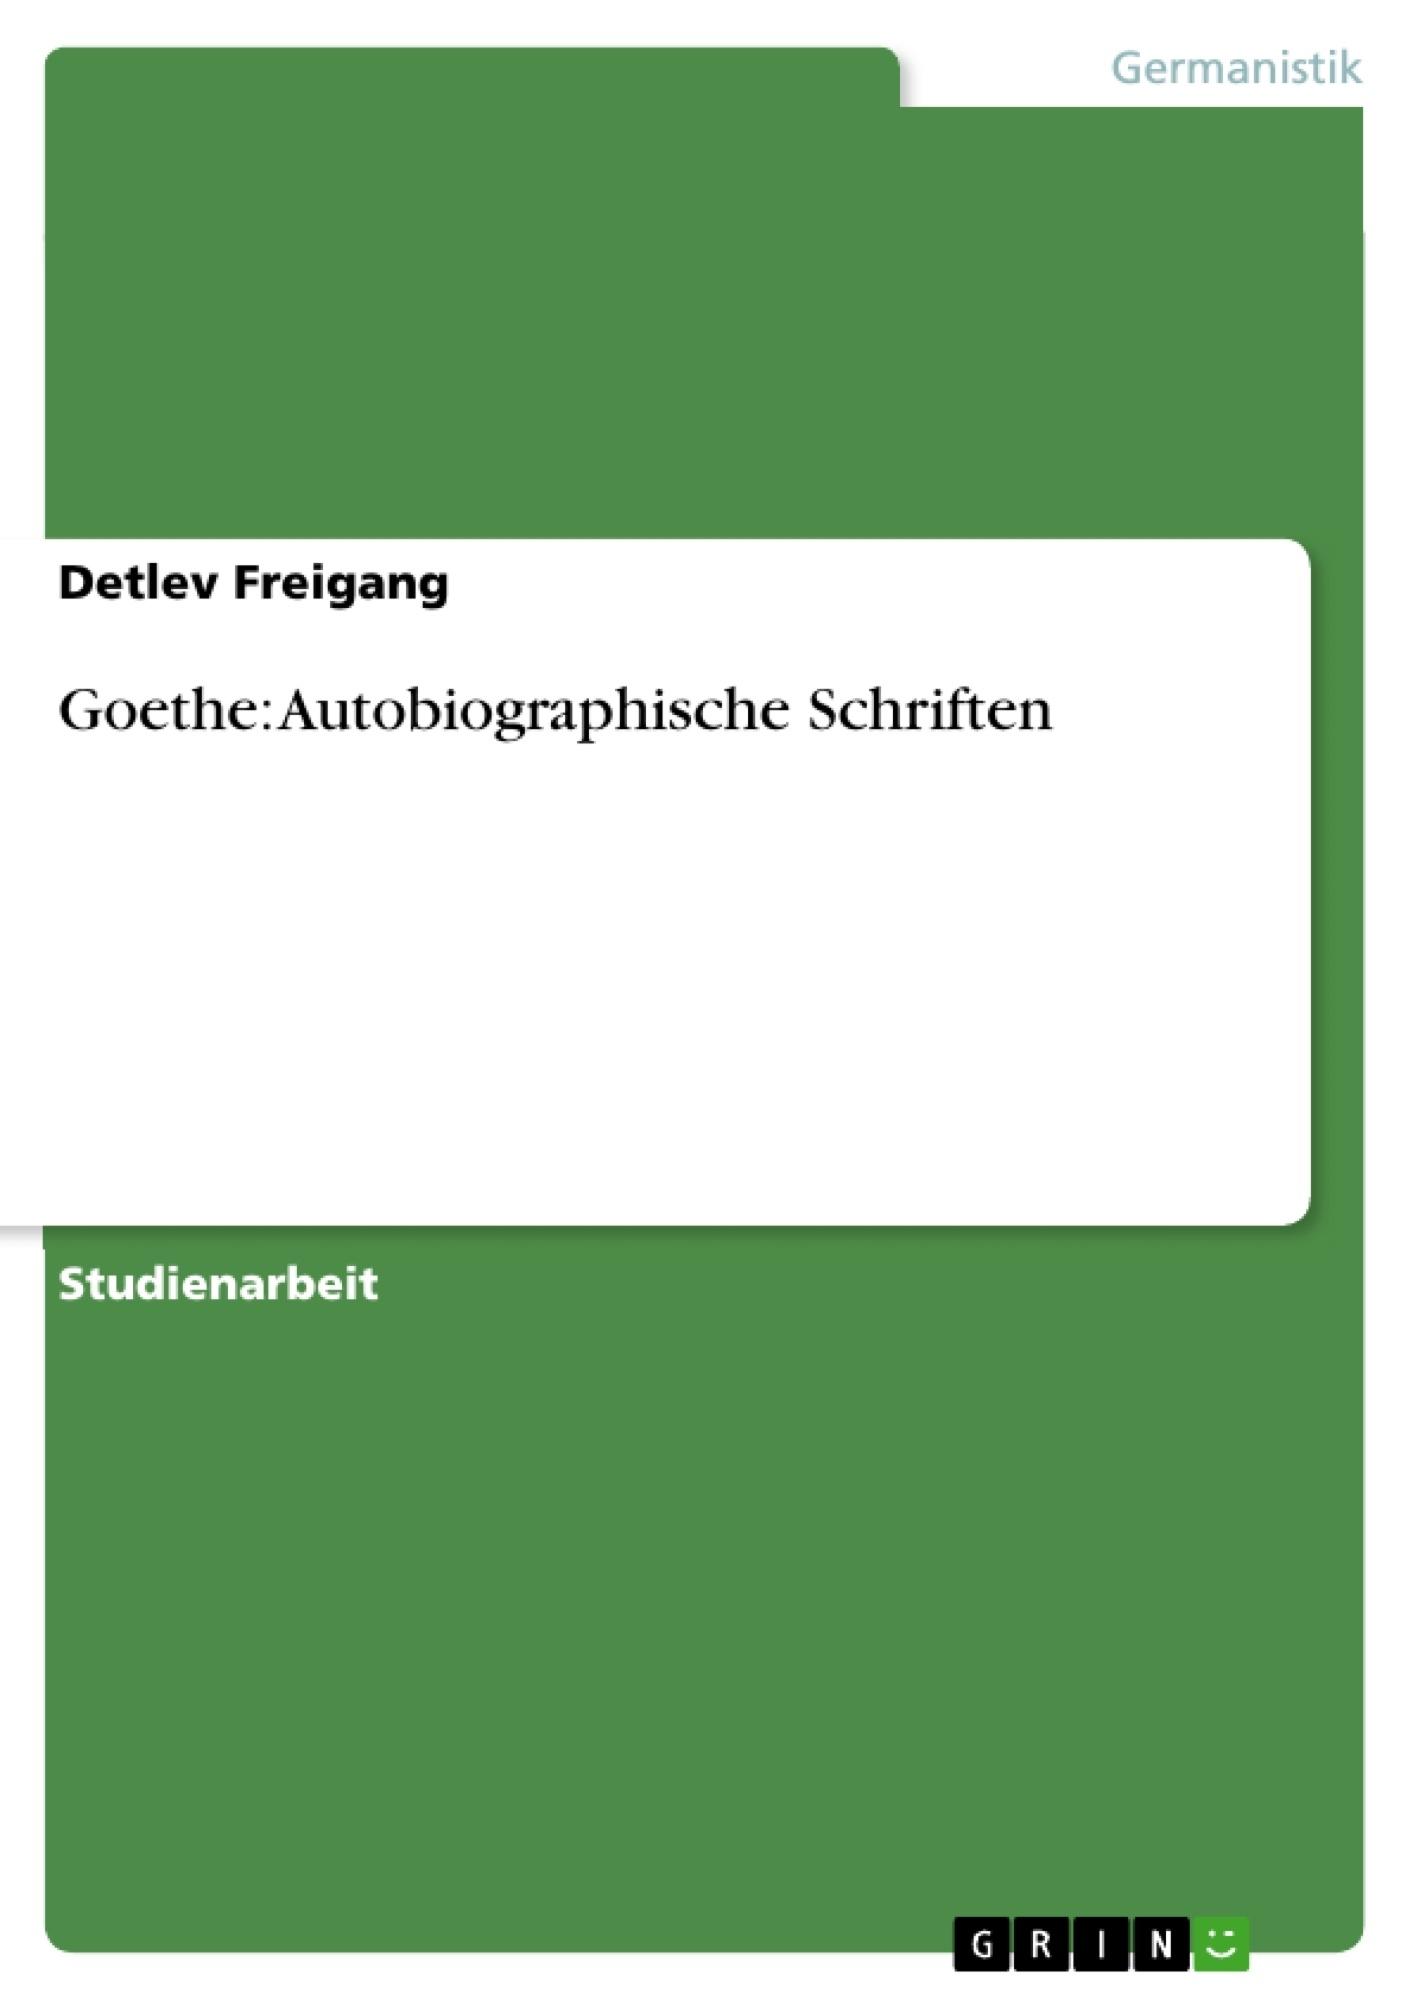 Titel: Goethe: Autobiographische Schriften